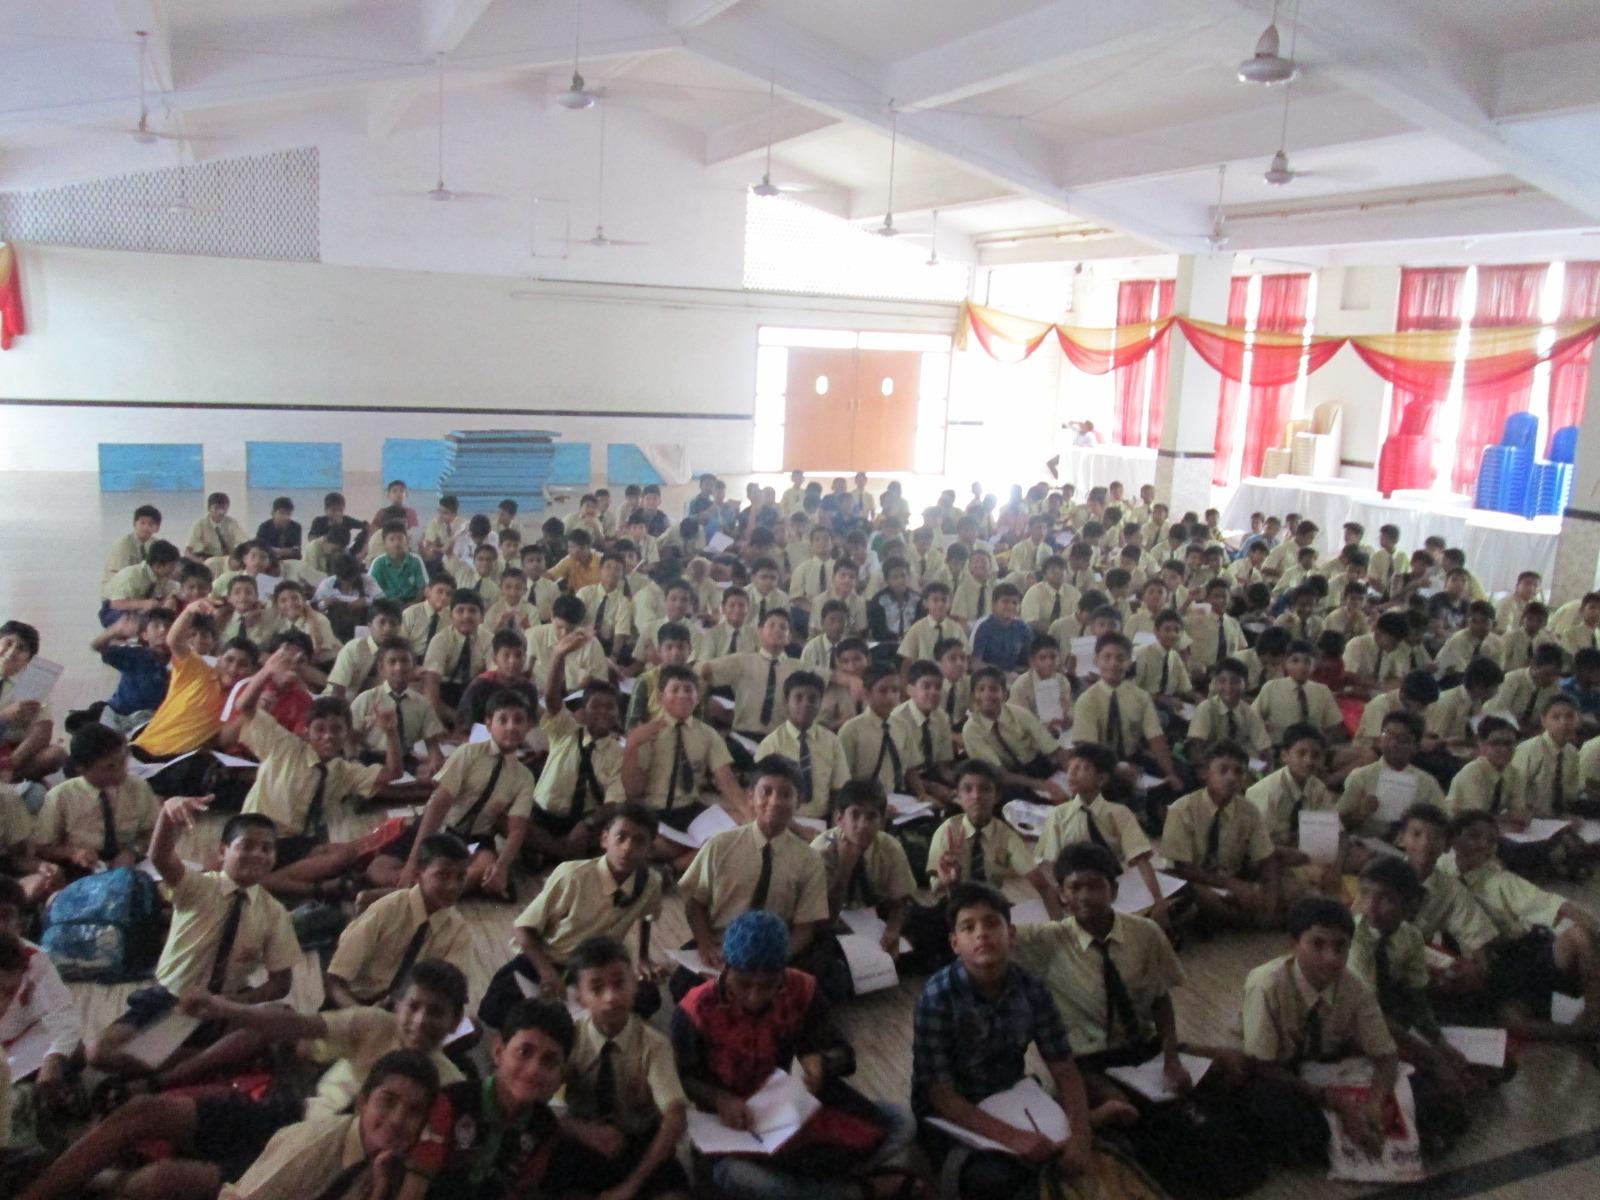 St. Theresa's School Bandra